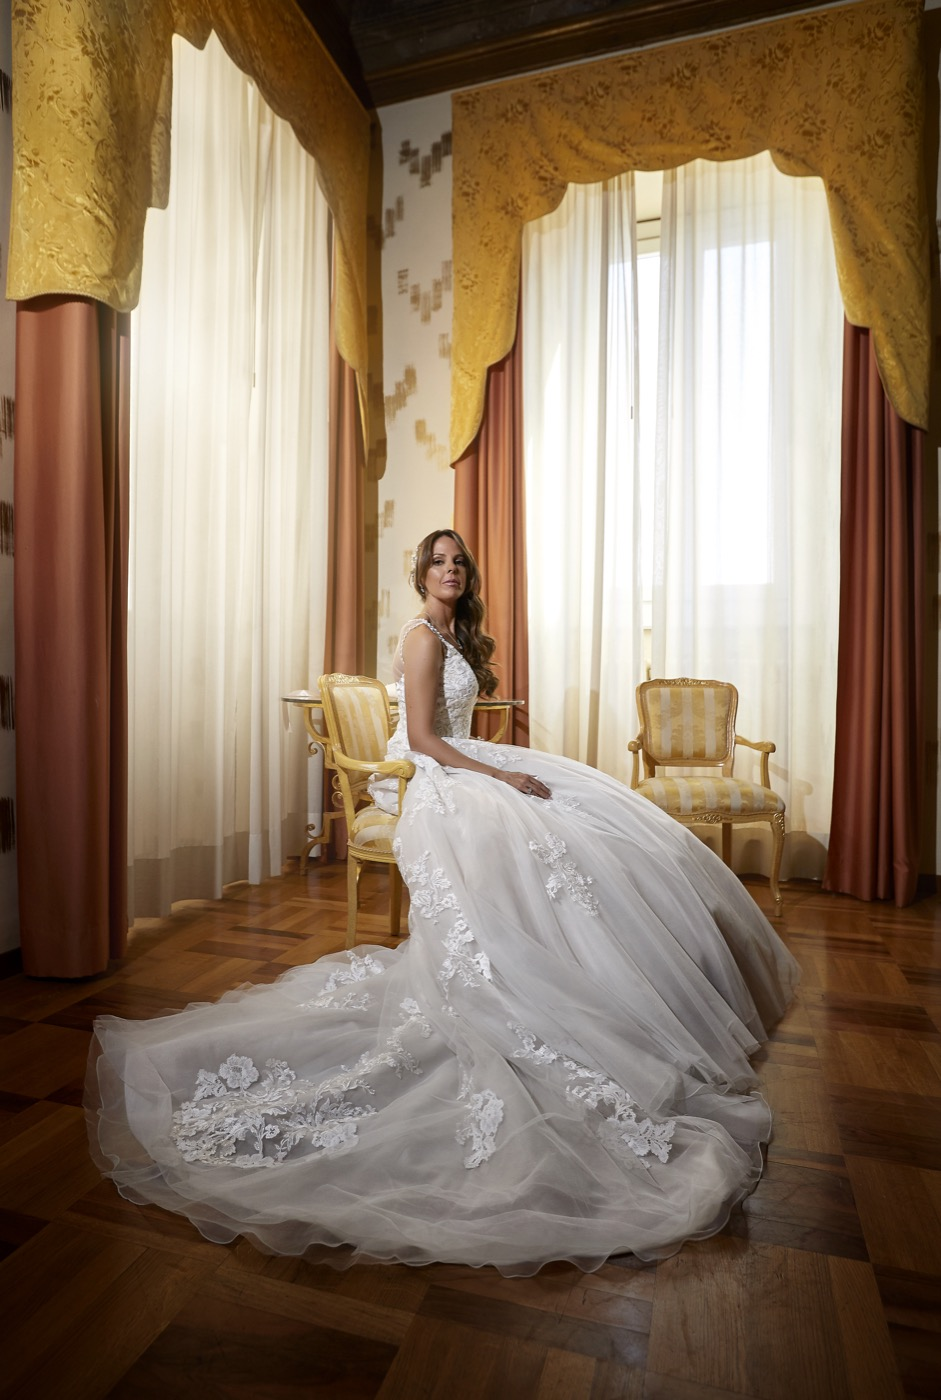 Claudio-Coppola-wedding-photographer-la-scuderia-eventi-preparativi-la-rosetta-perugia-34